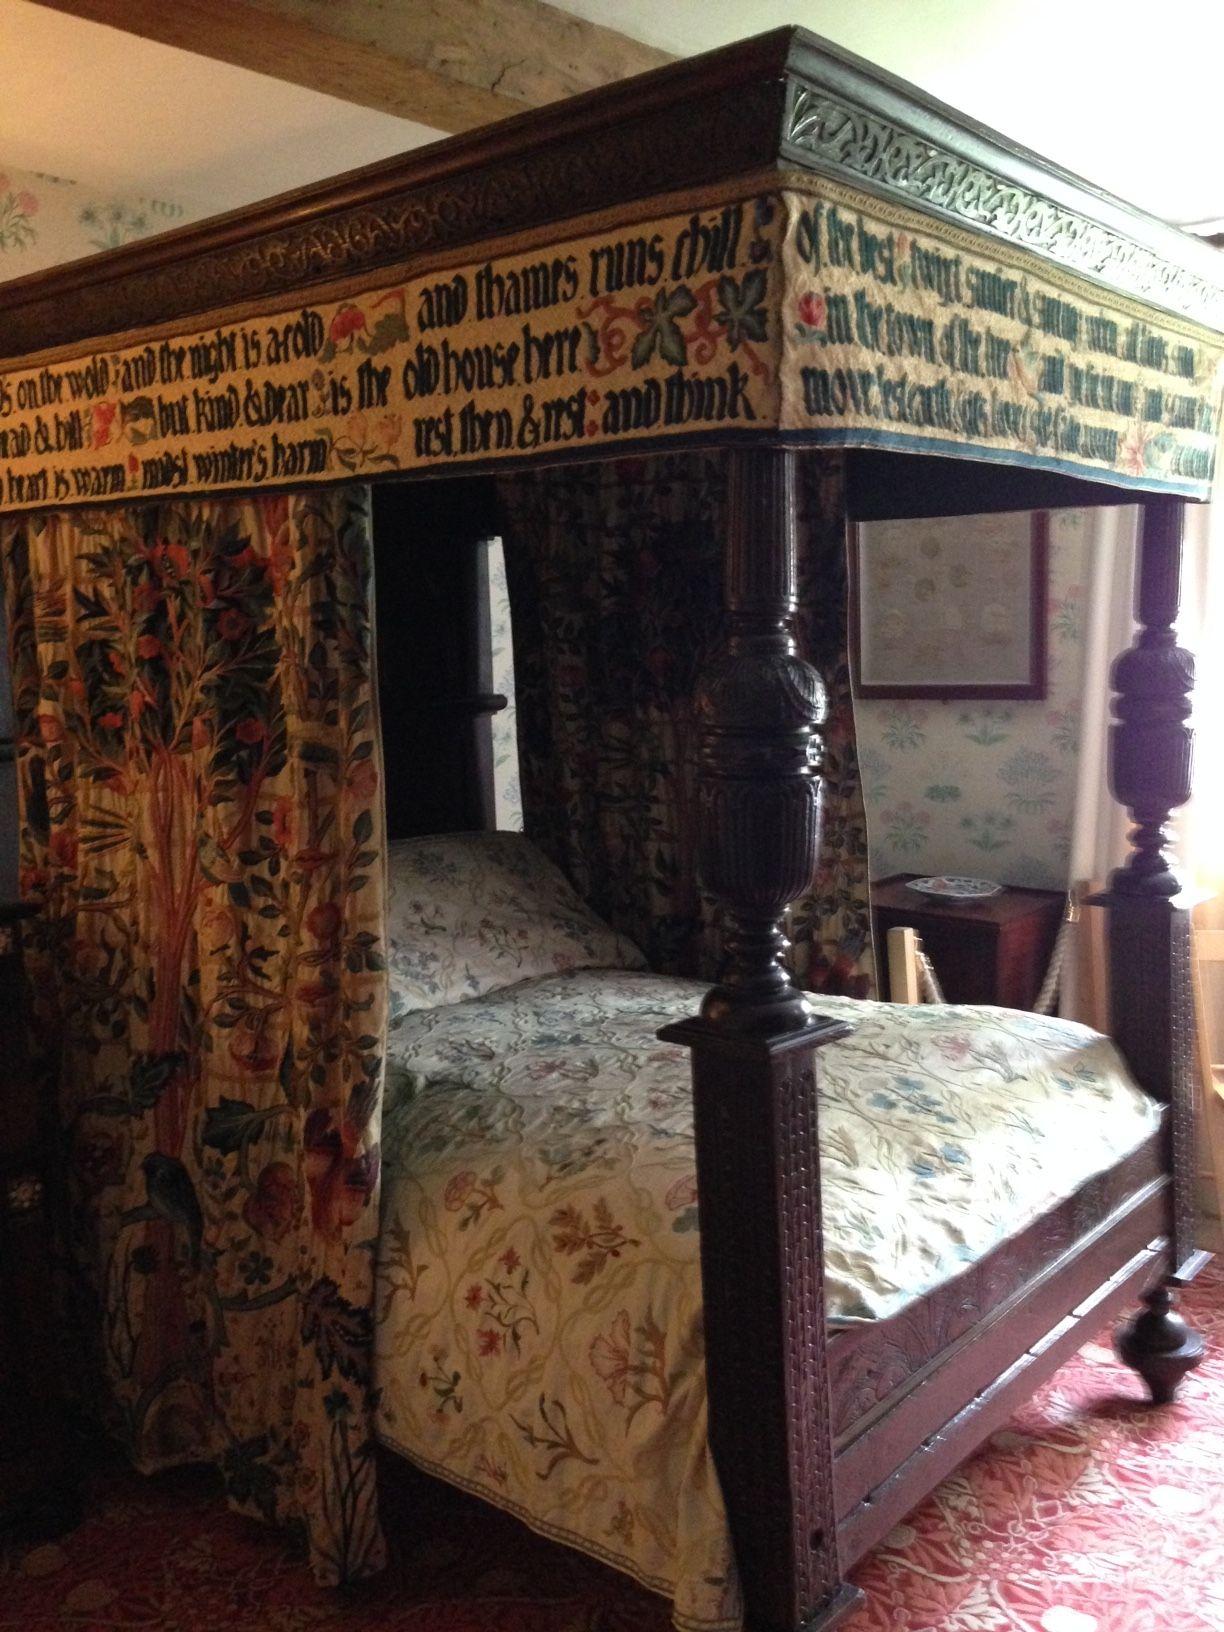 A look inside the arts craftsstyle kelmscott manor